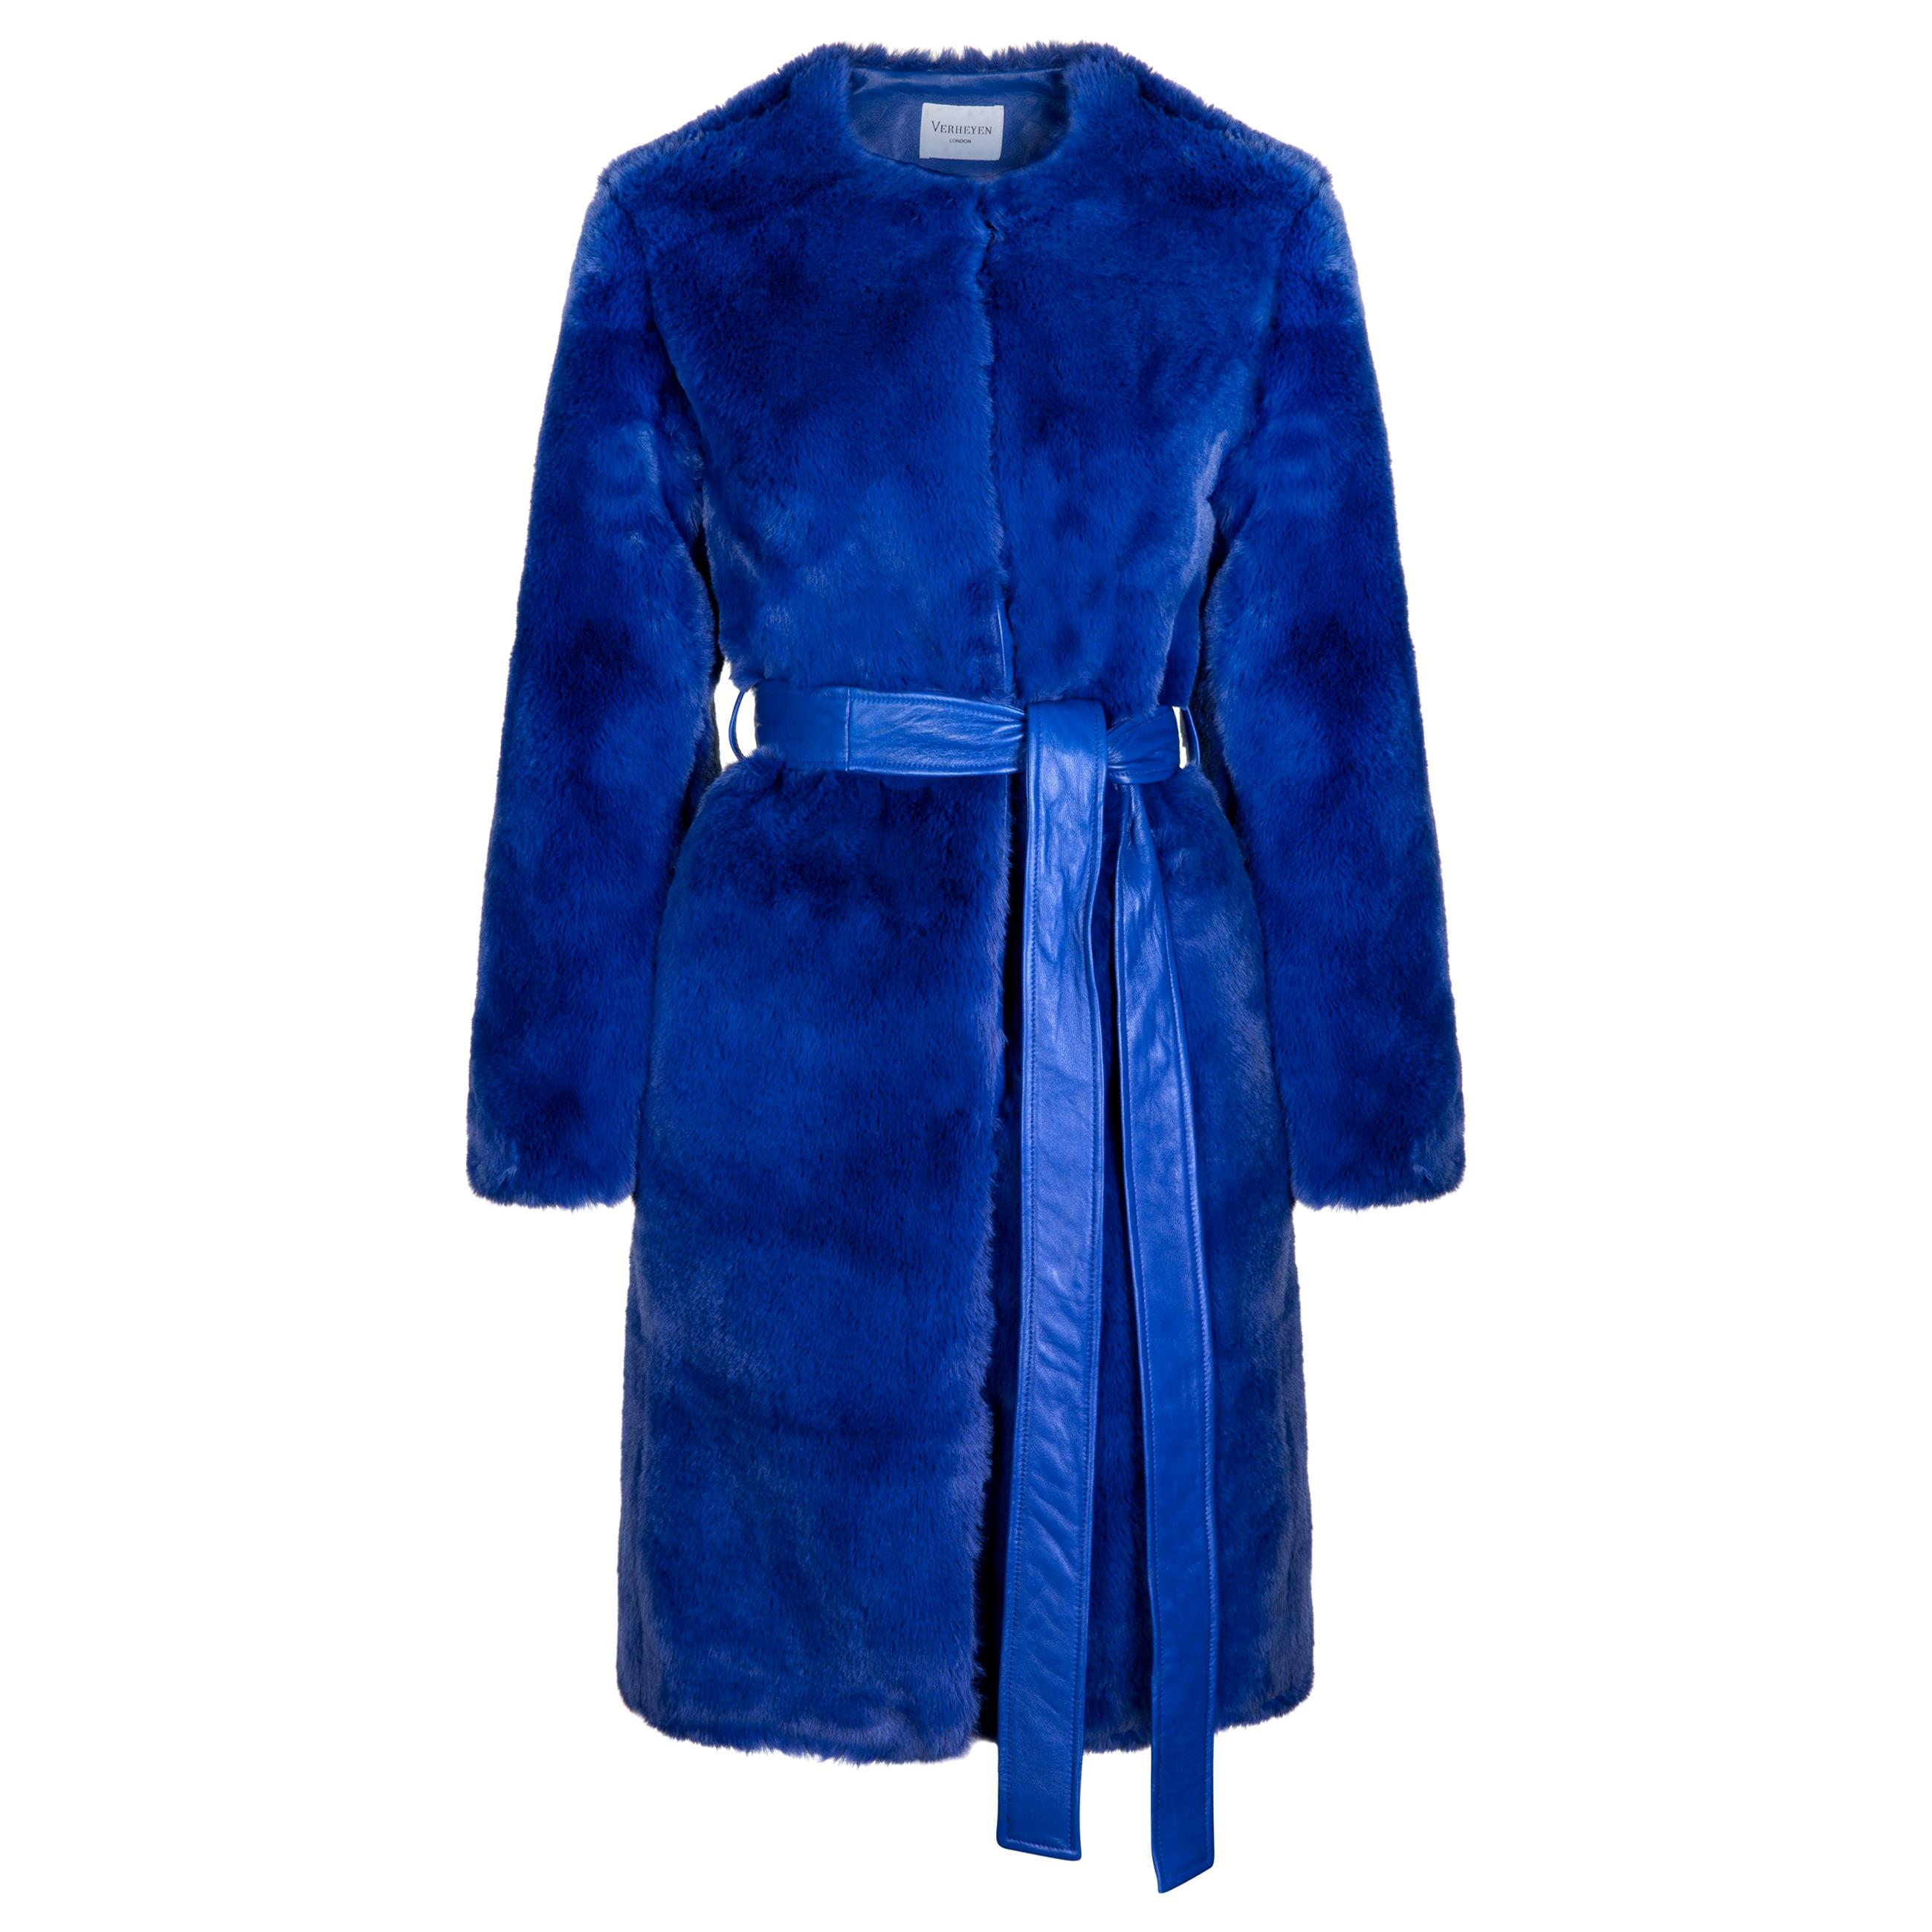 Verheyen London Serena  Collarless Faux Fur Coat in Blue - Size uk 12